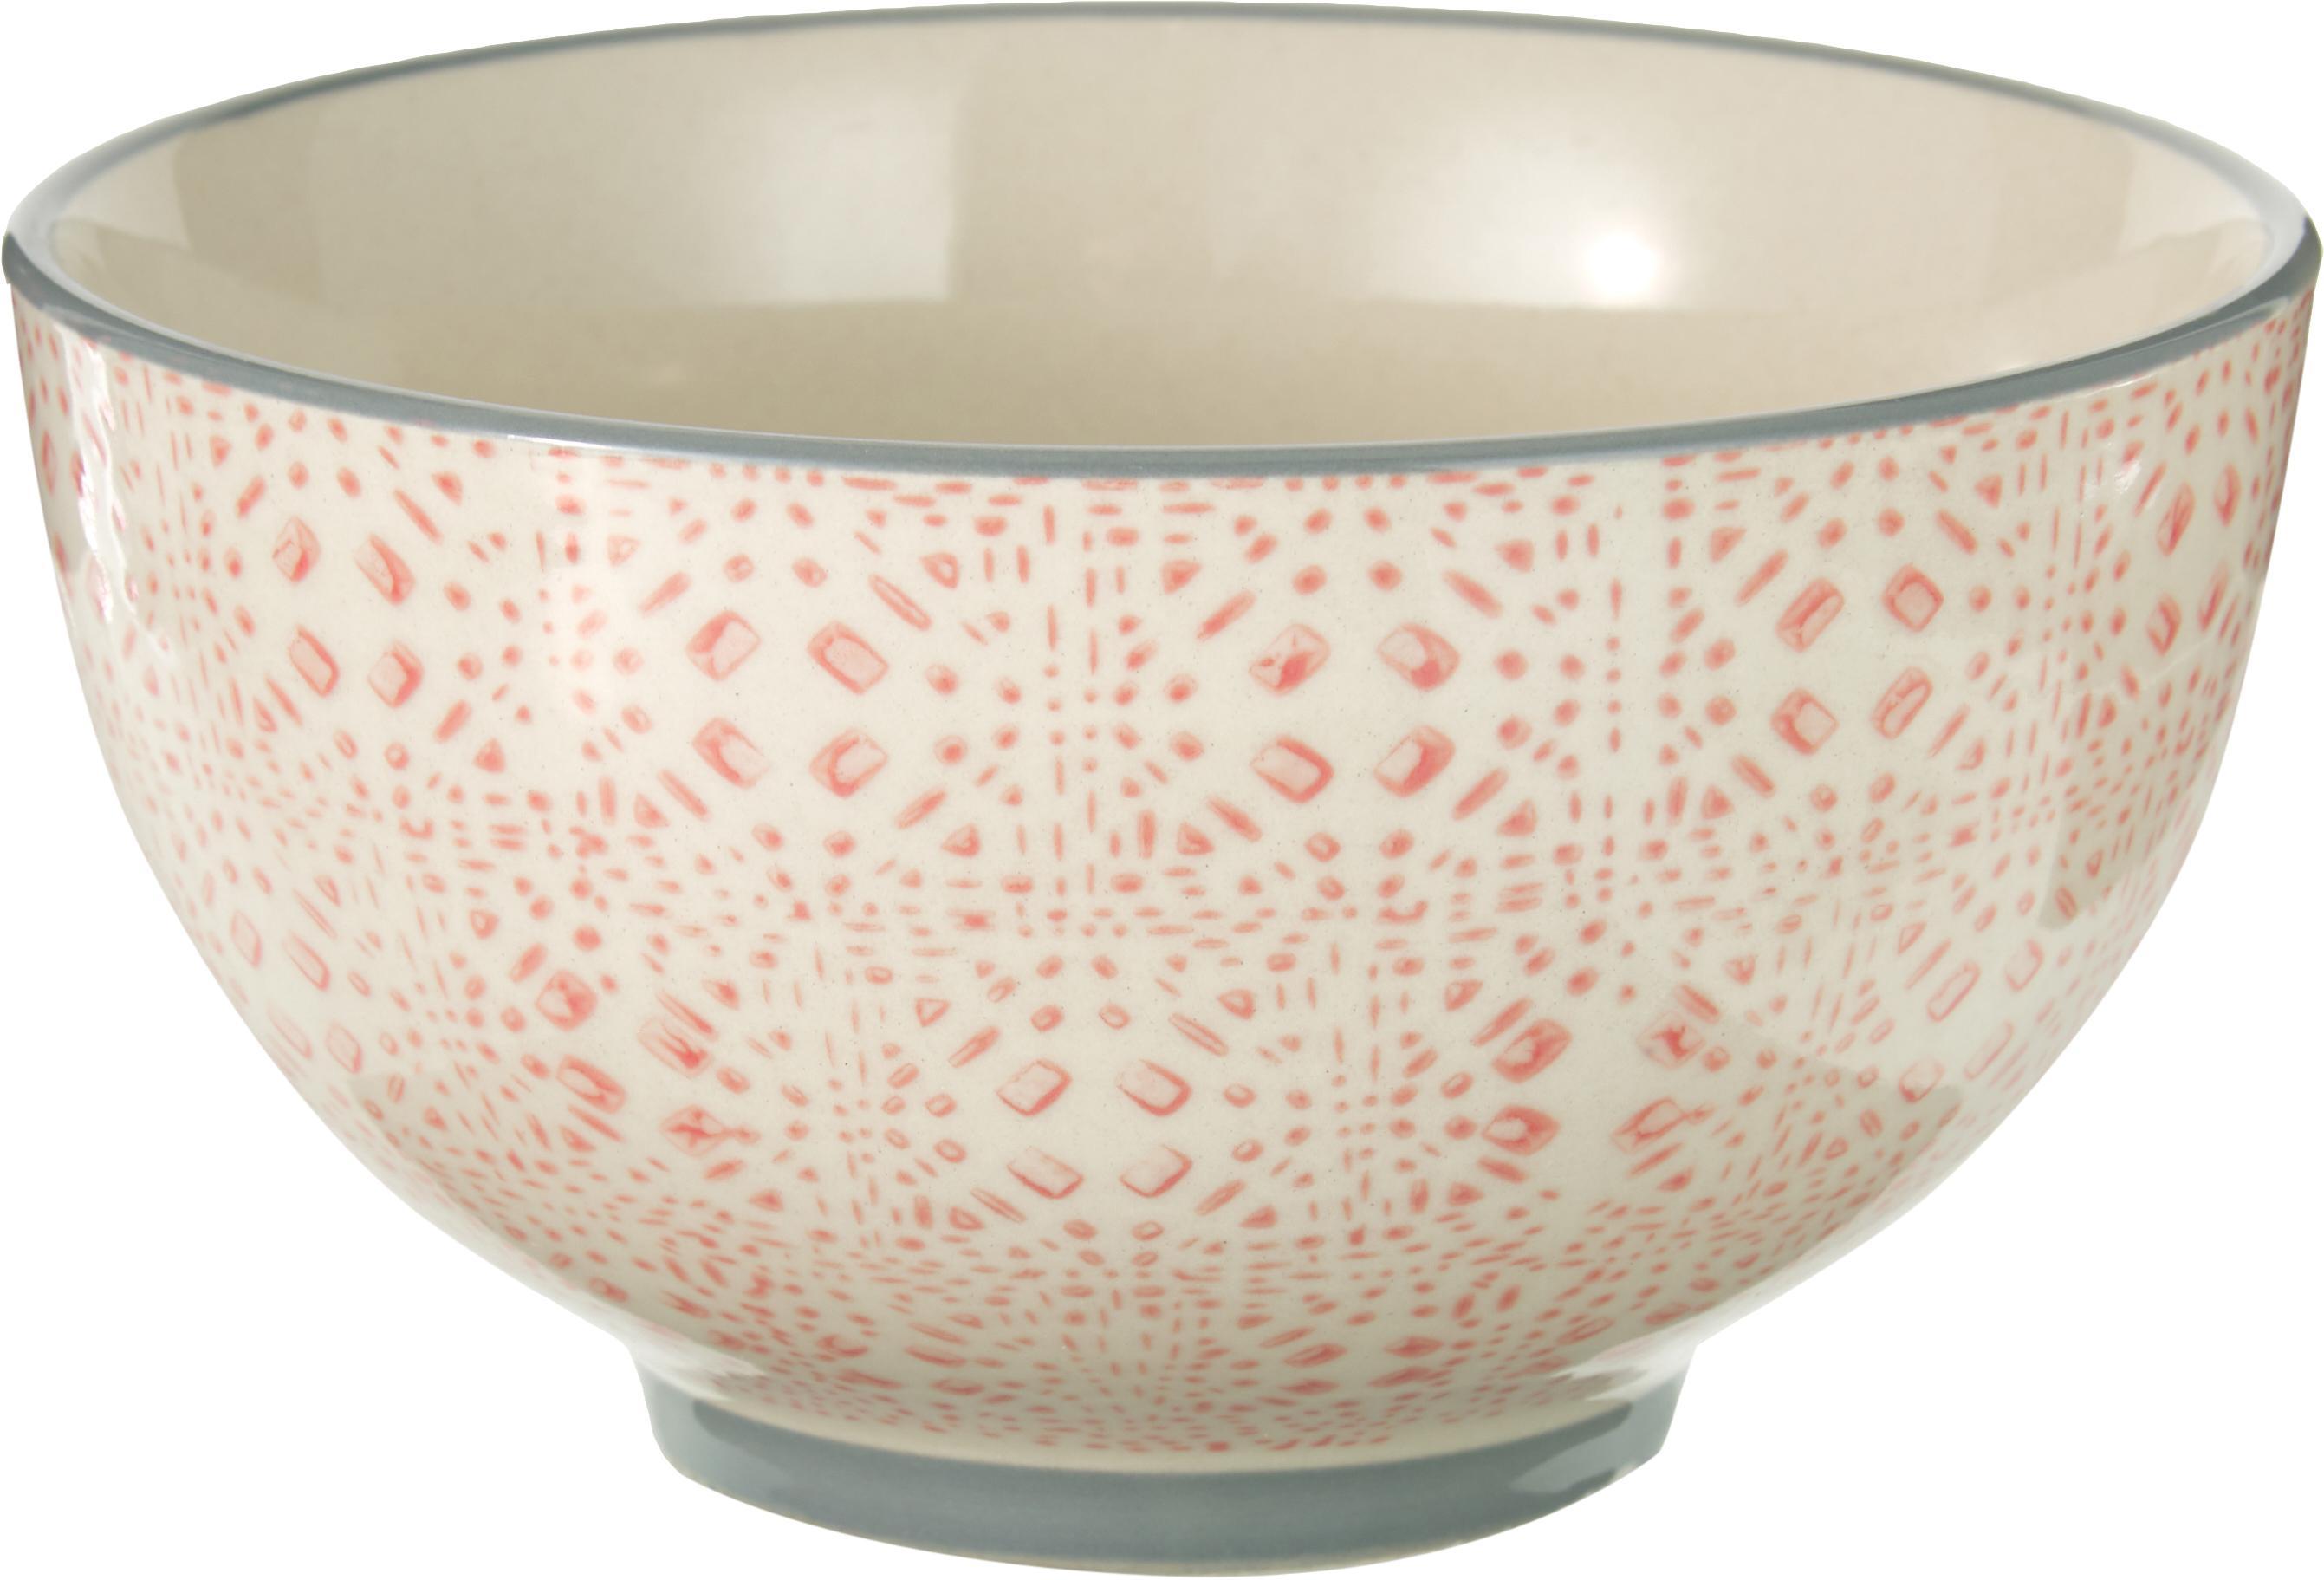 Schälchen Cécile mit kleinem Muster, 4er-Set, Keramik, Rosa, Grau, Beige, Ø 13 x H 8 cm